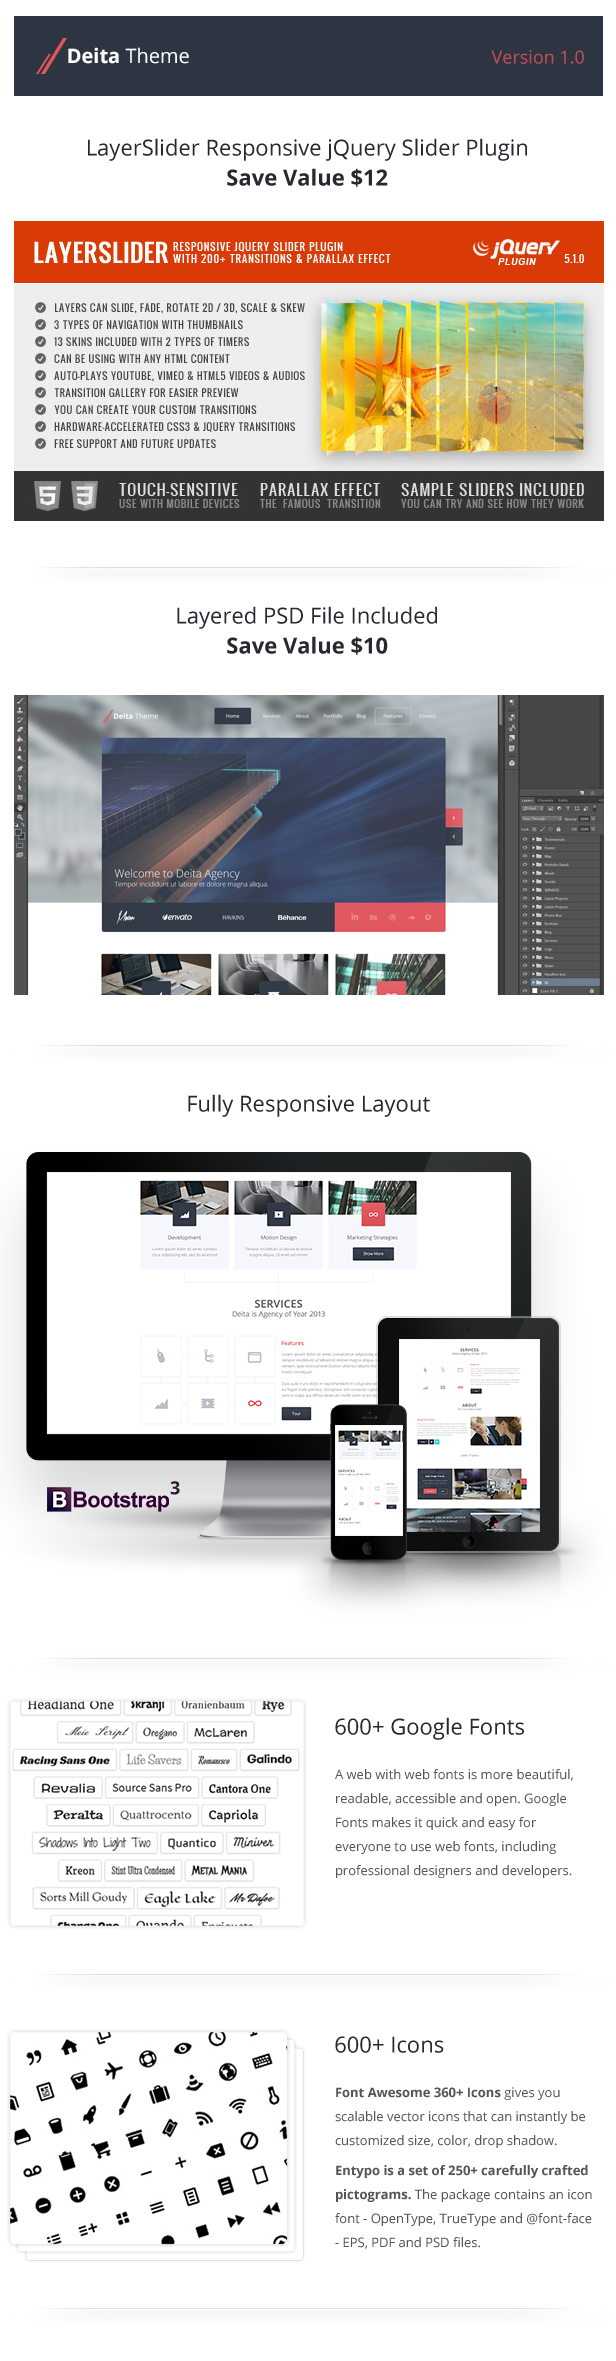 Deita Theme - Responsive Agency HTML Template